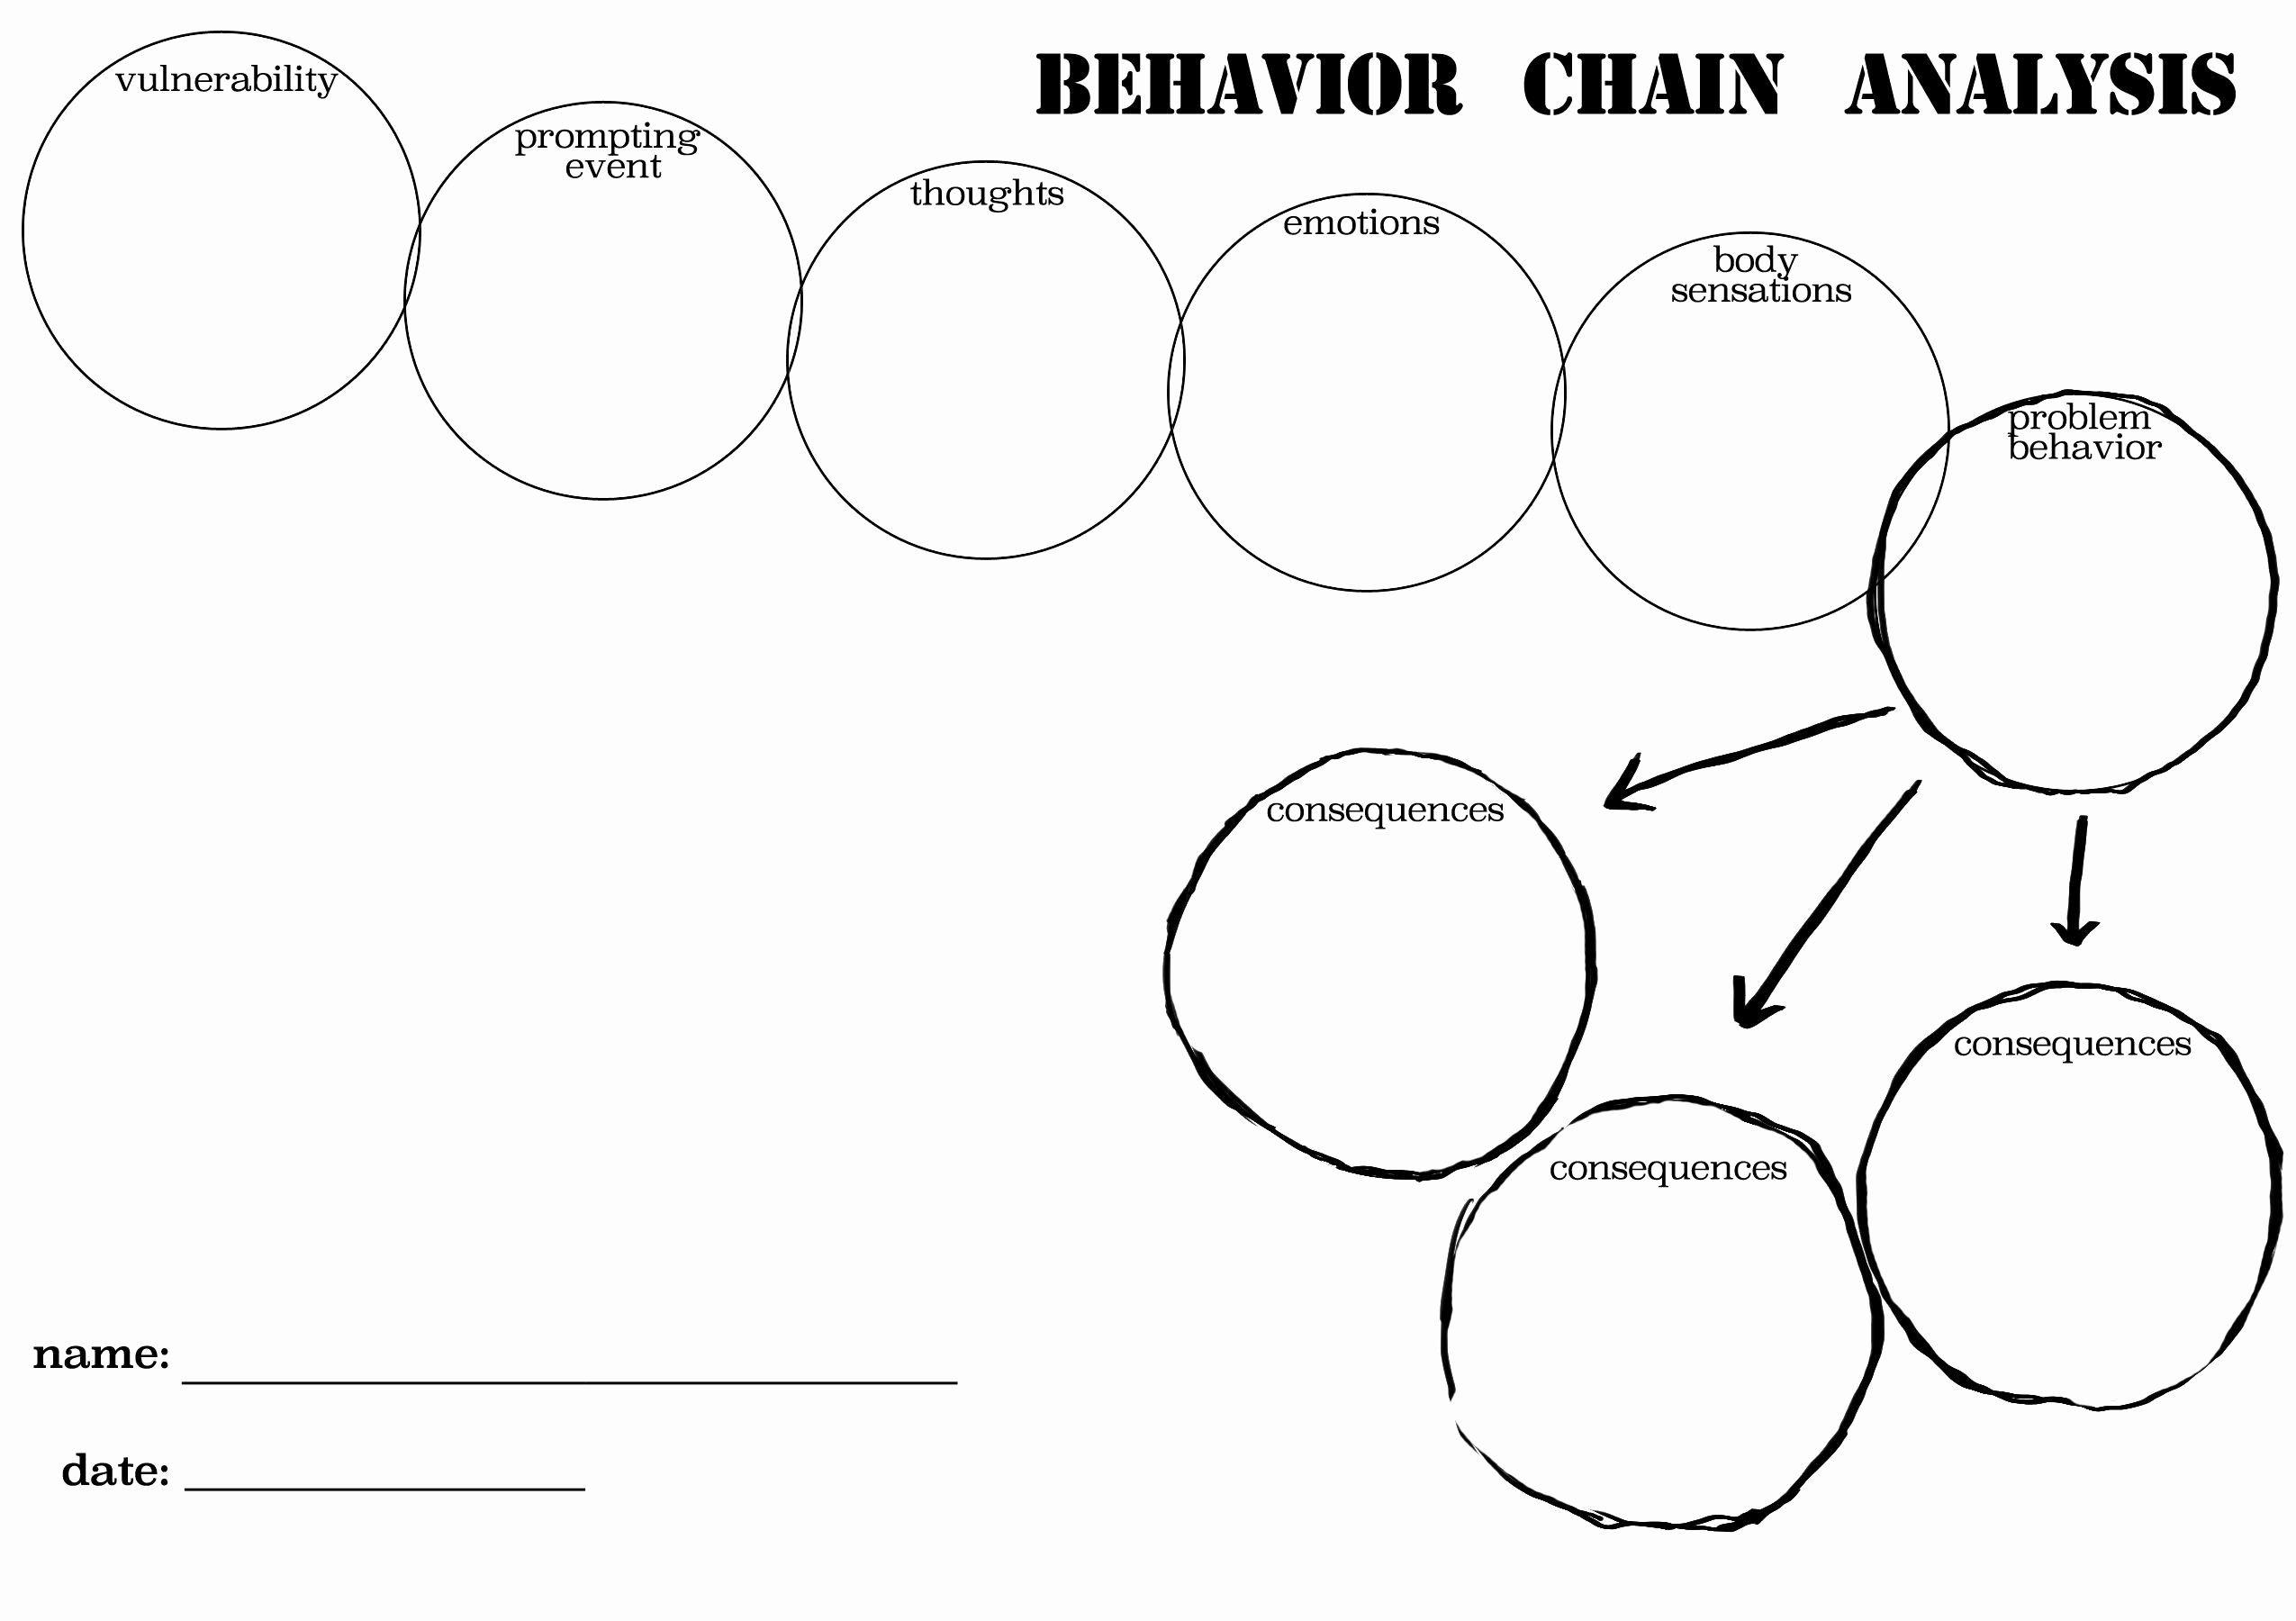 Written Document Analysis Worksheet Answers Fresh Art Analysis Worksheet Yooob Dbt Skills Worksheets Dbt Skills Adolescent Therapy Behavior chain analysis worksheet